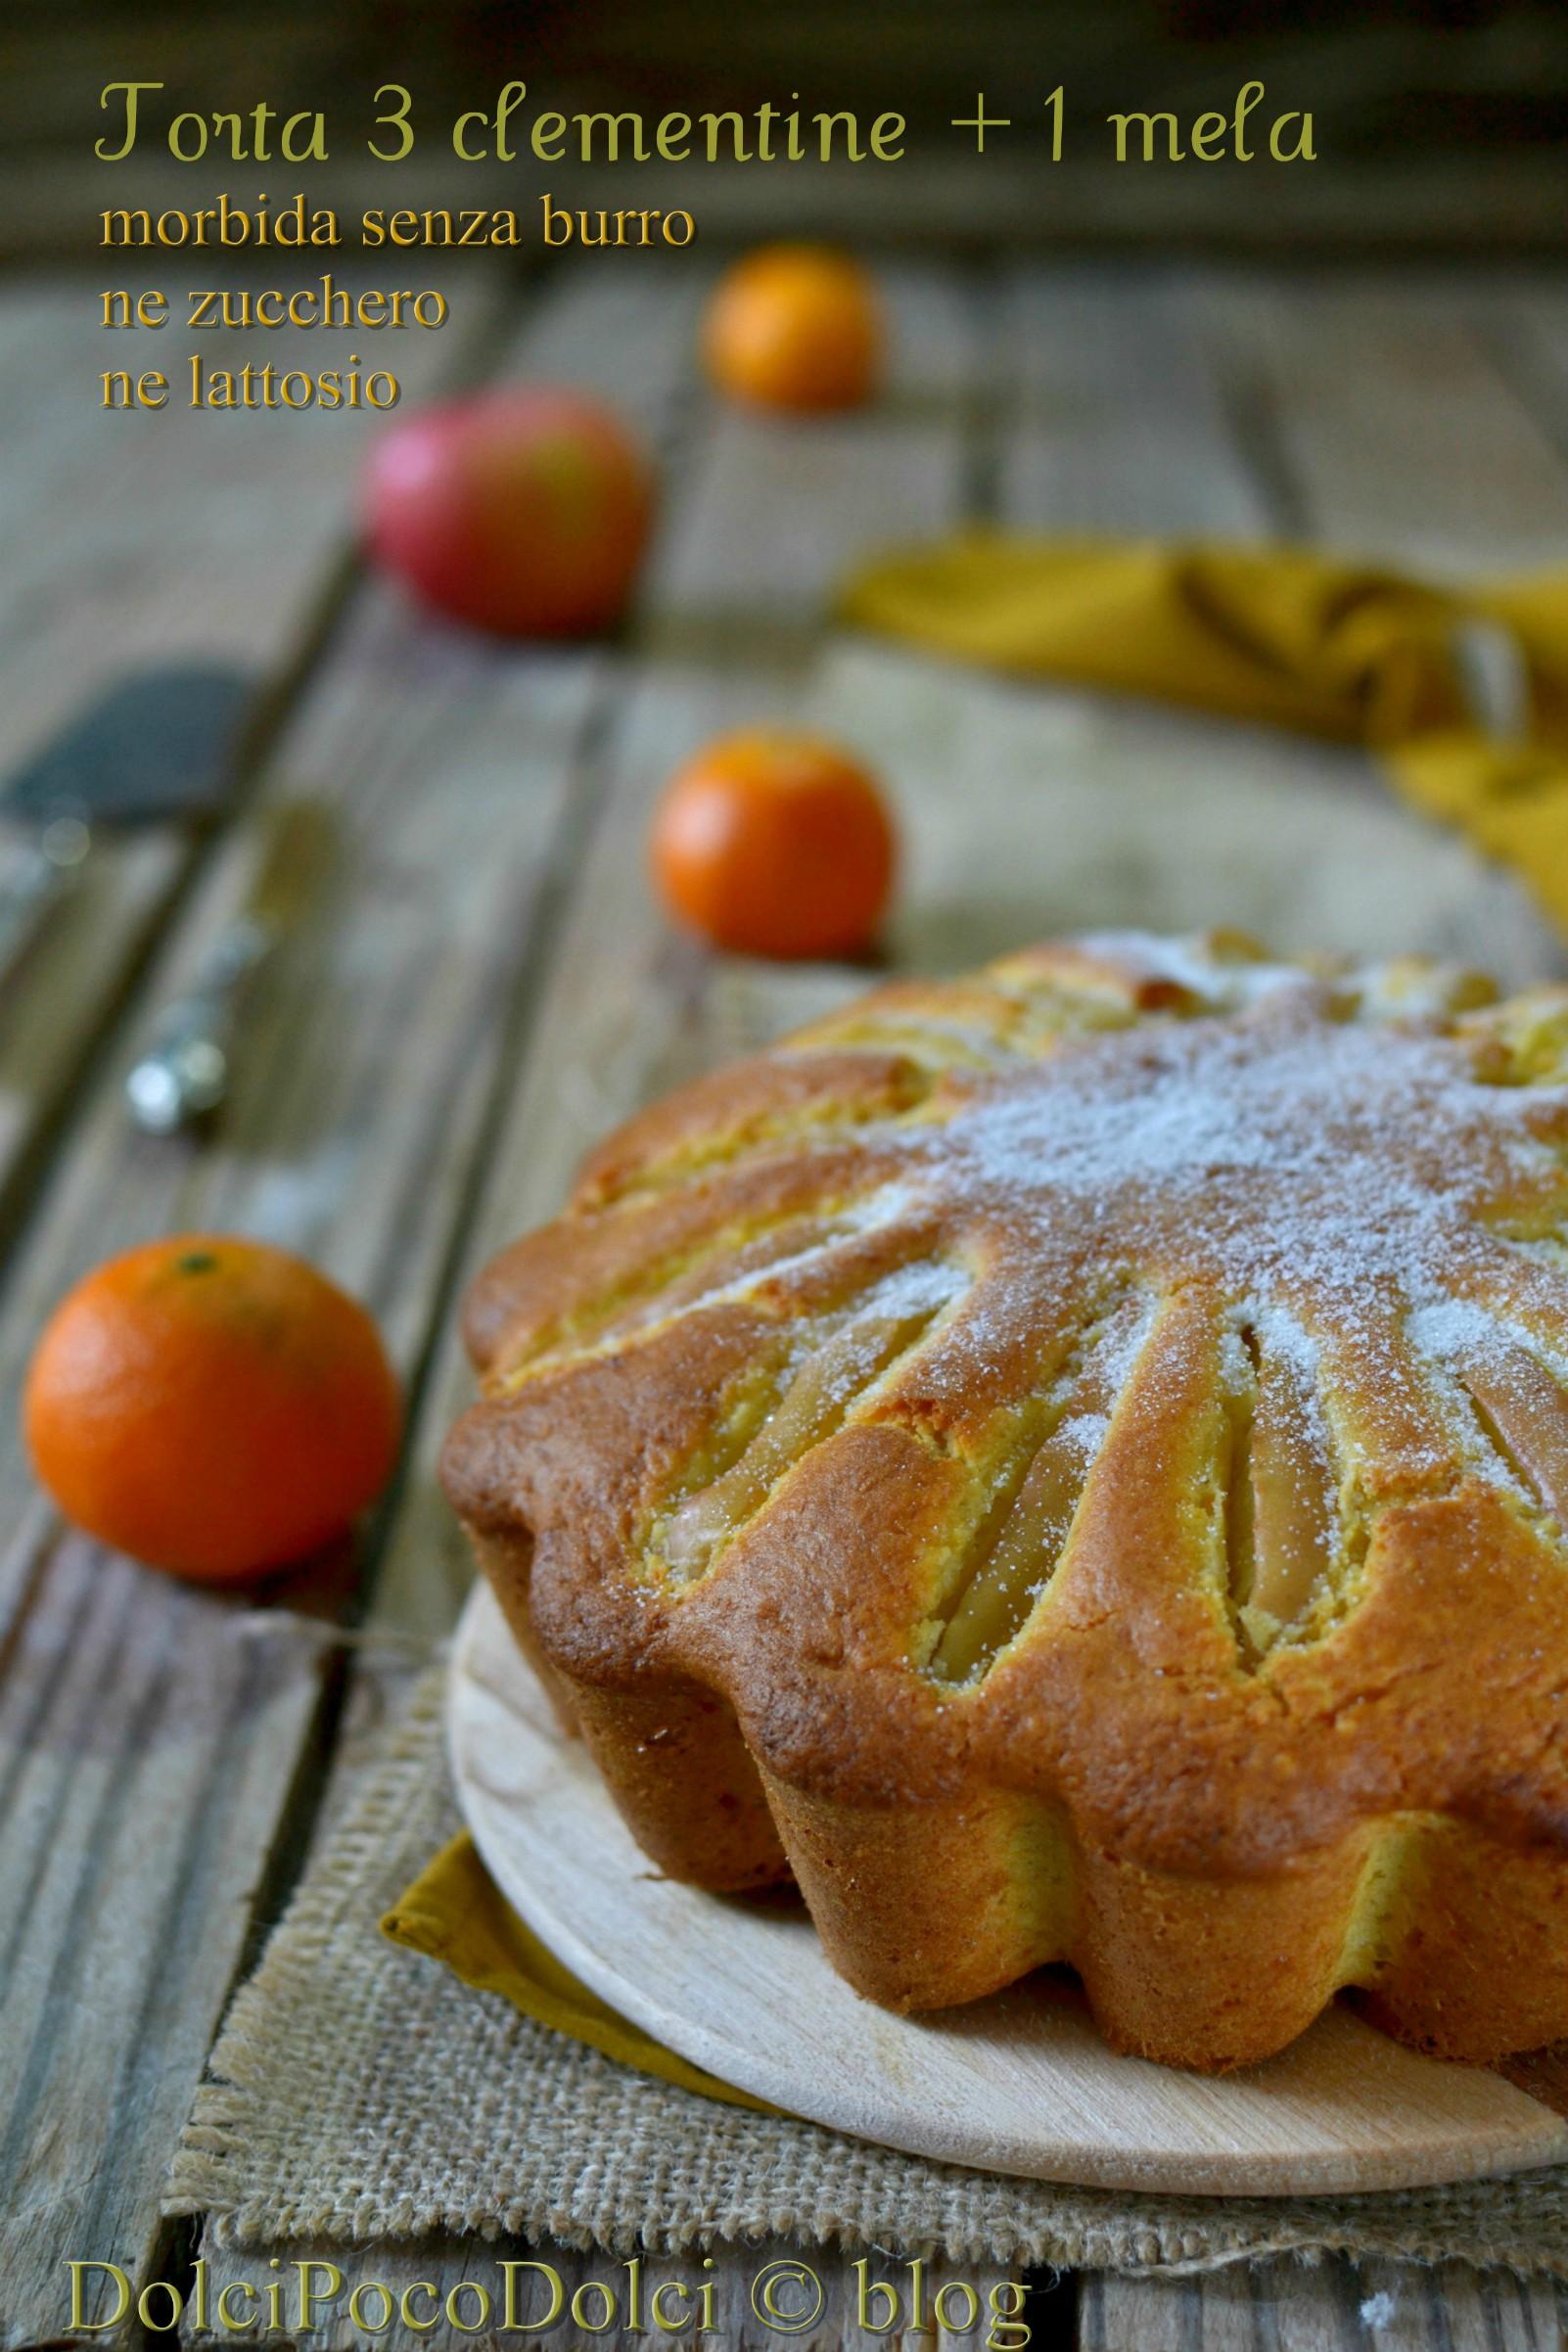 Torta 3 clementine + 1 mela - morbida senza burro ne zucchero ne lattosio